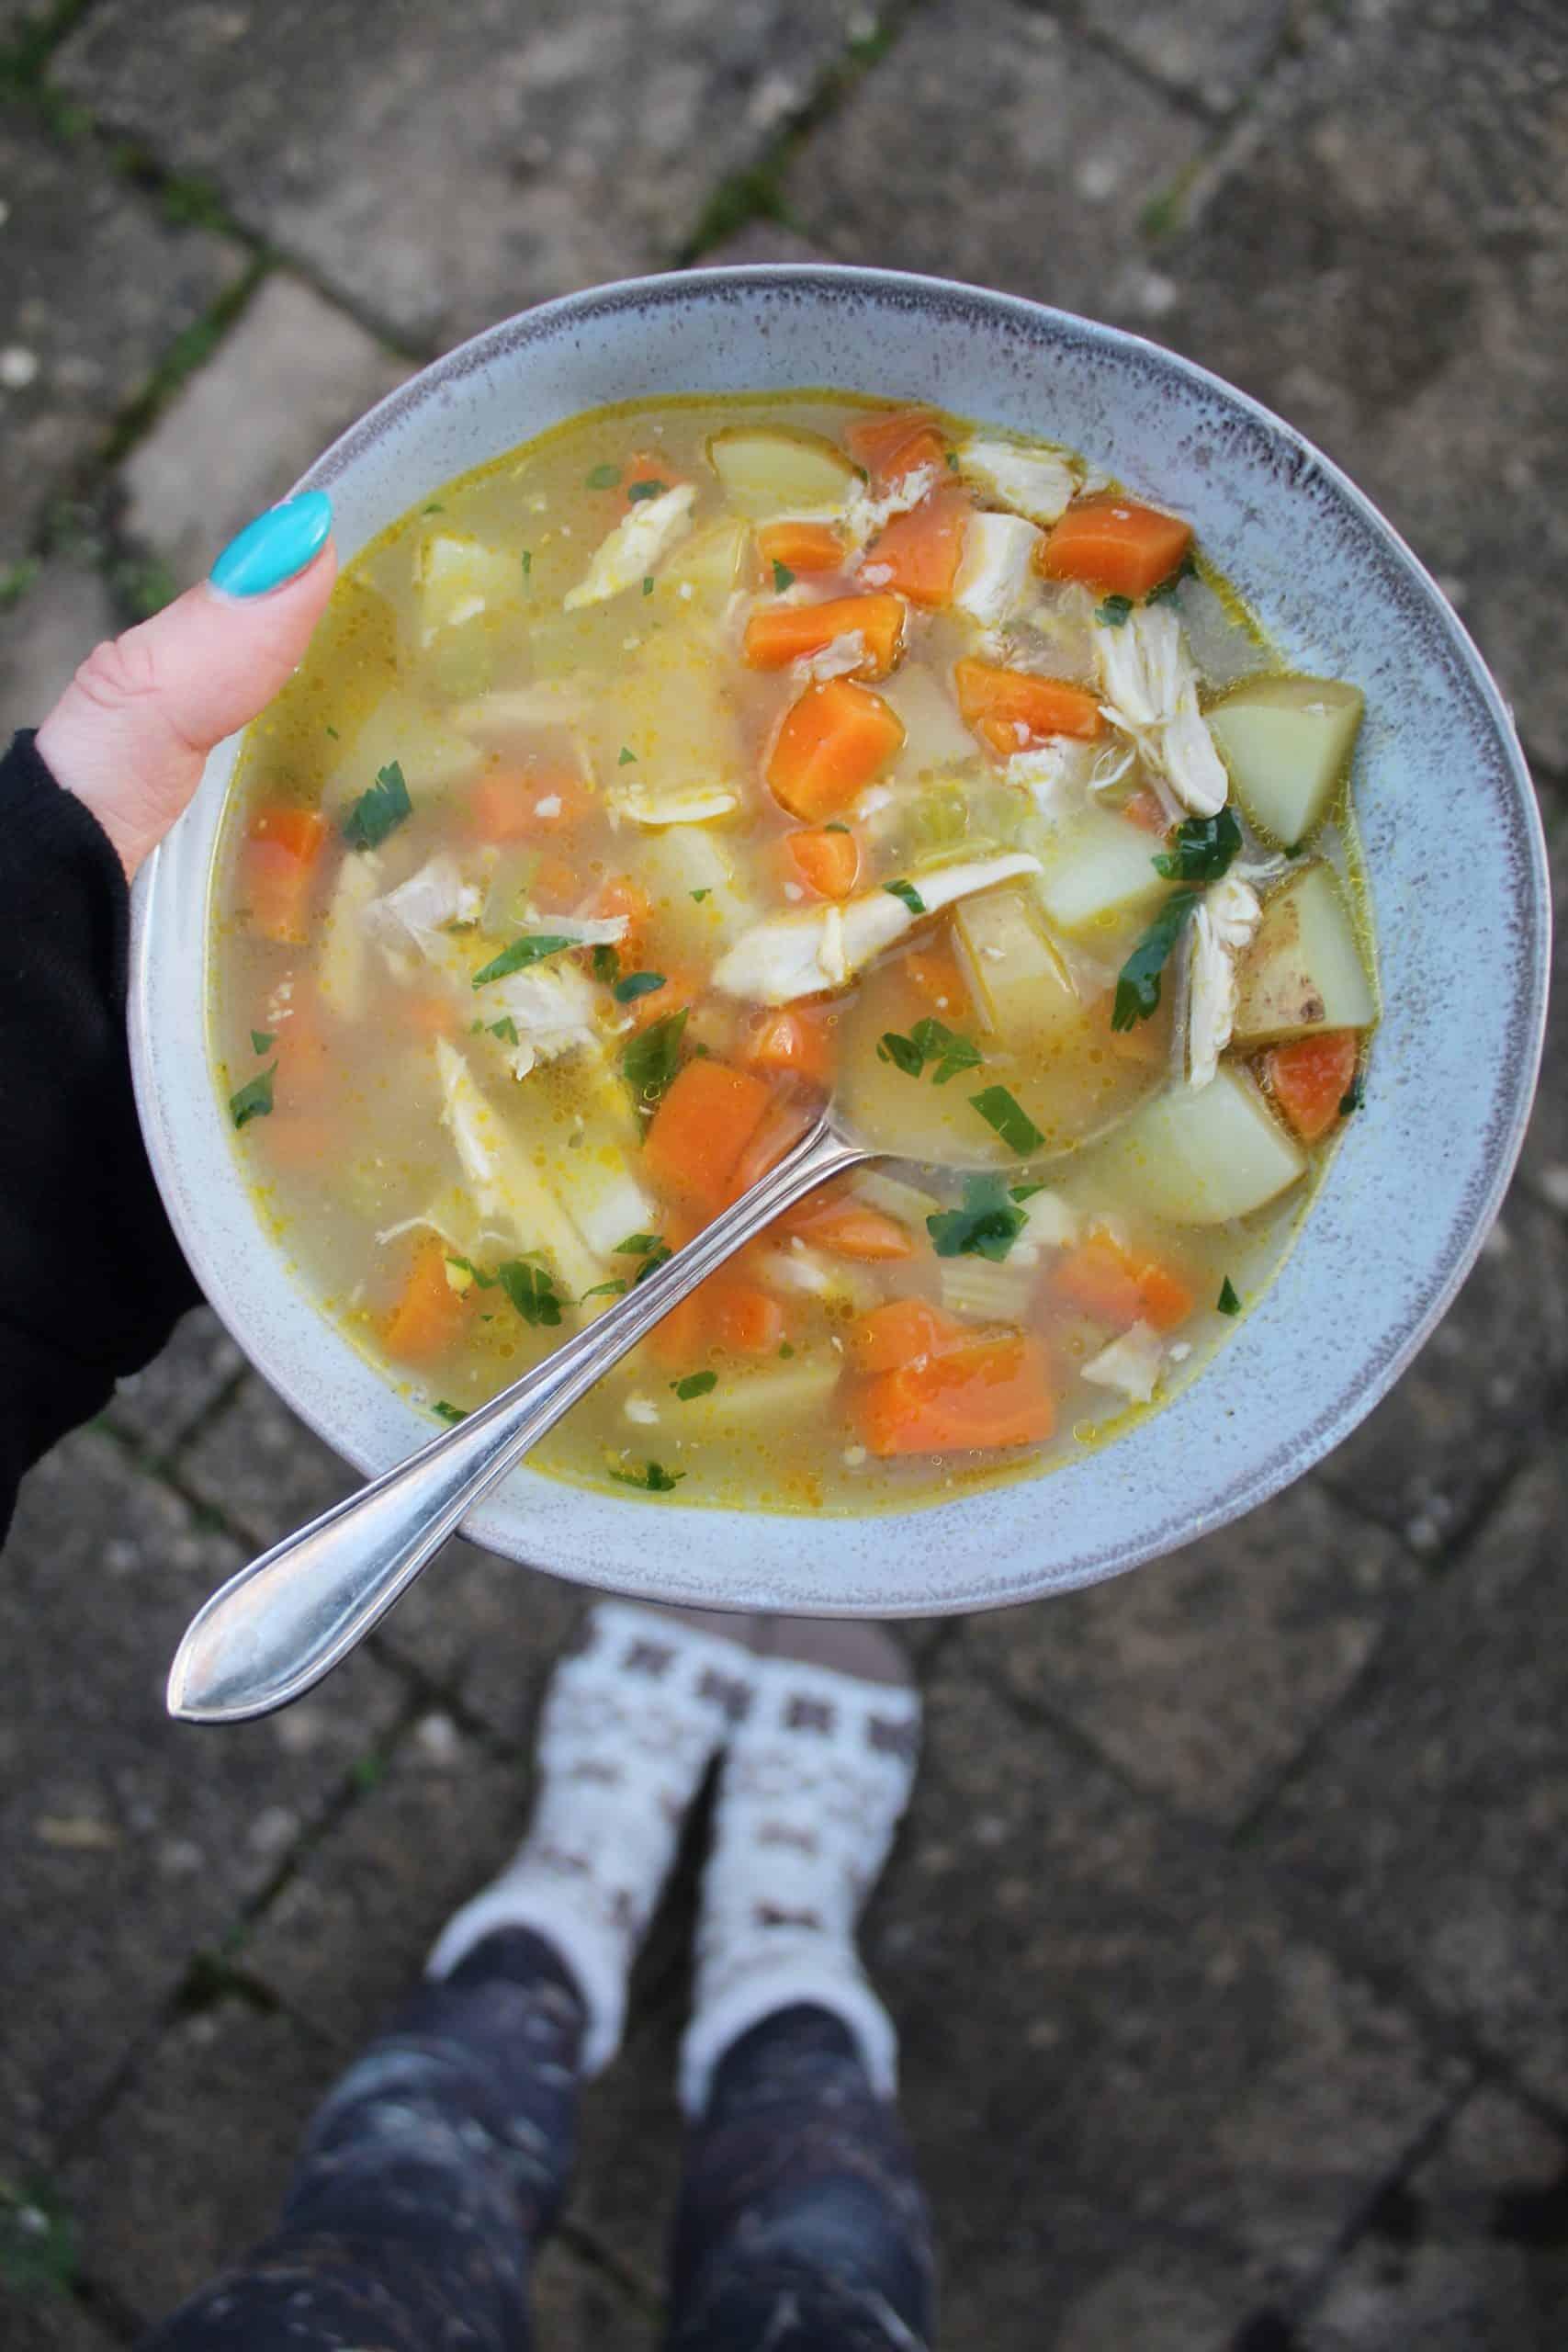 gluten free chicken soup recipe from roast chicken leftovers 8